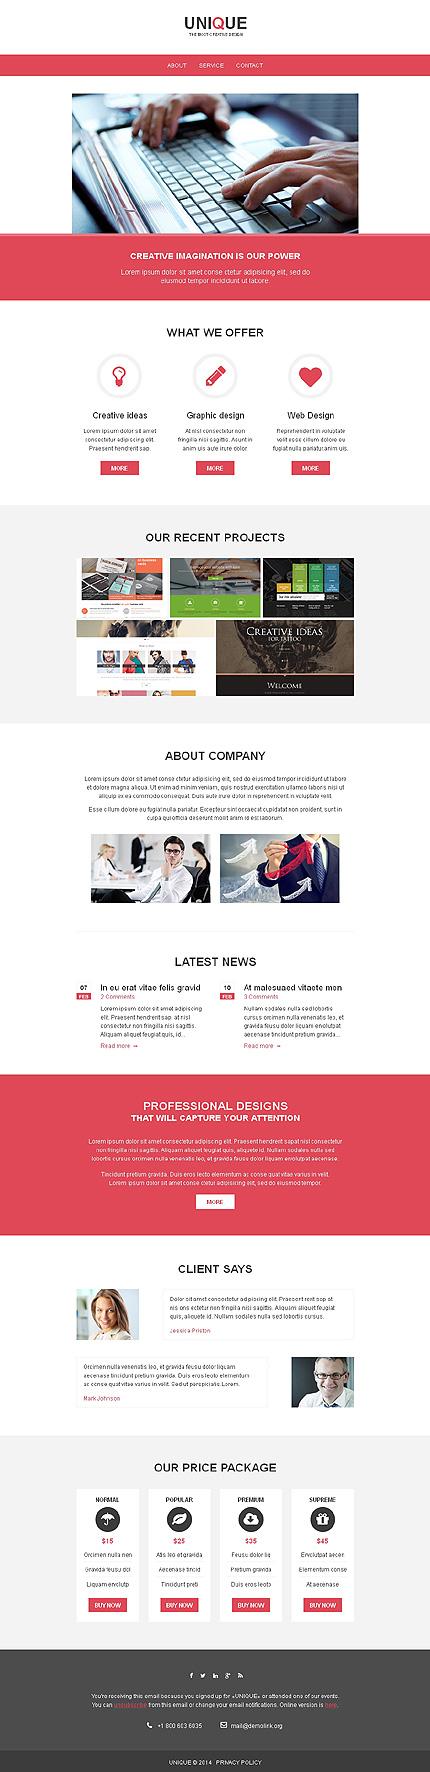 Website Template #49267